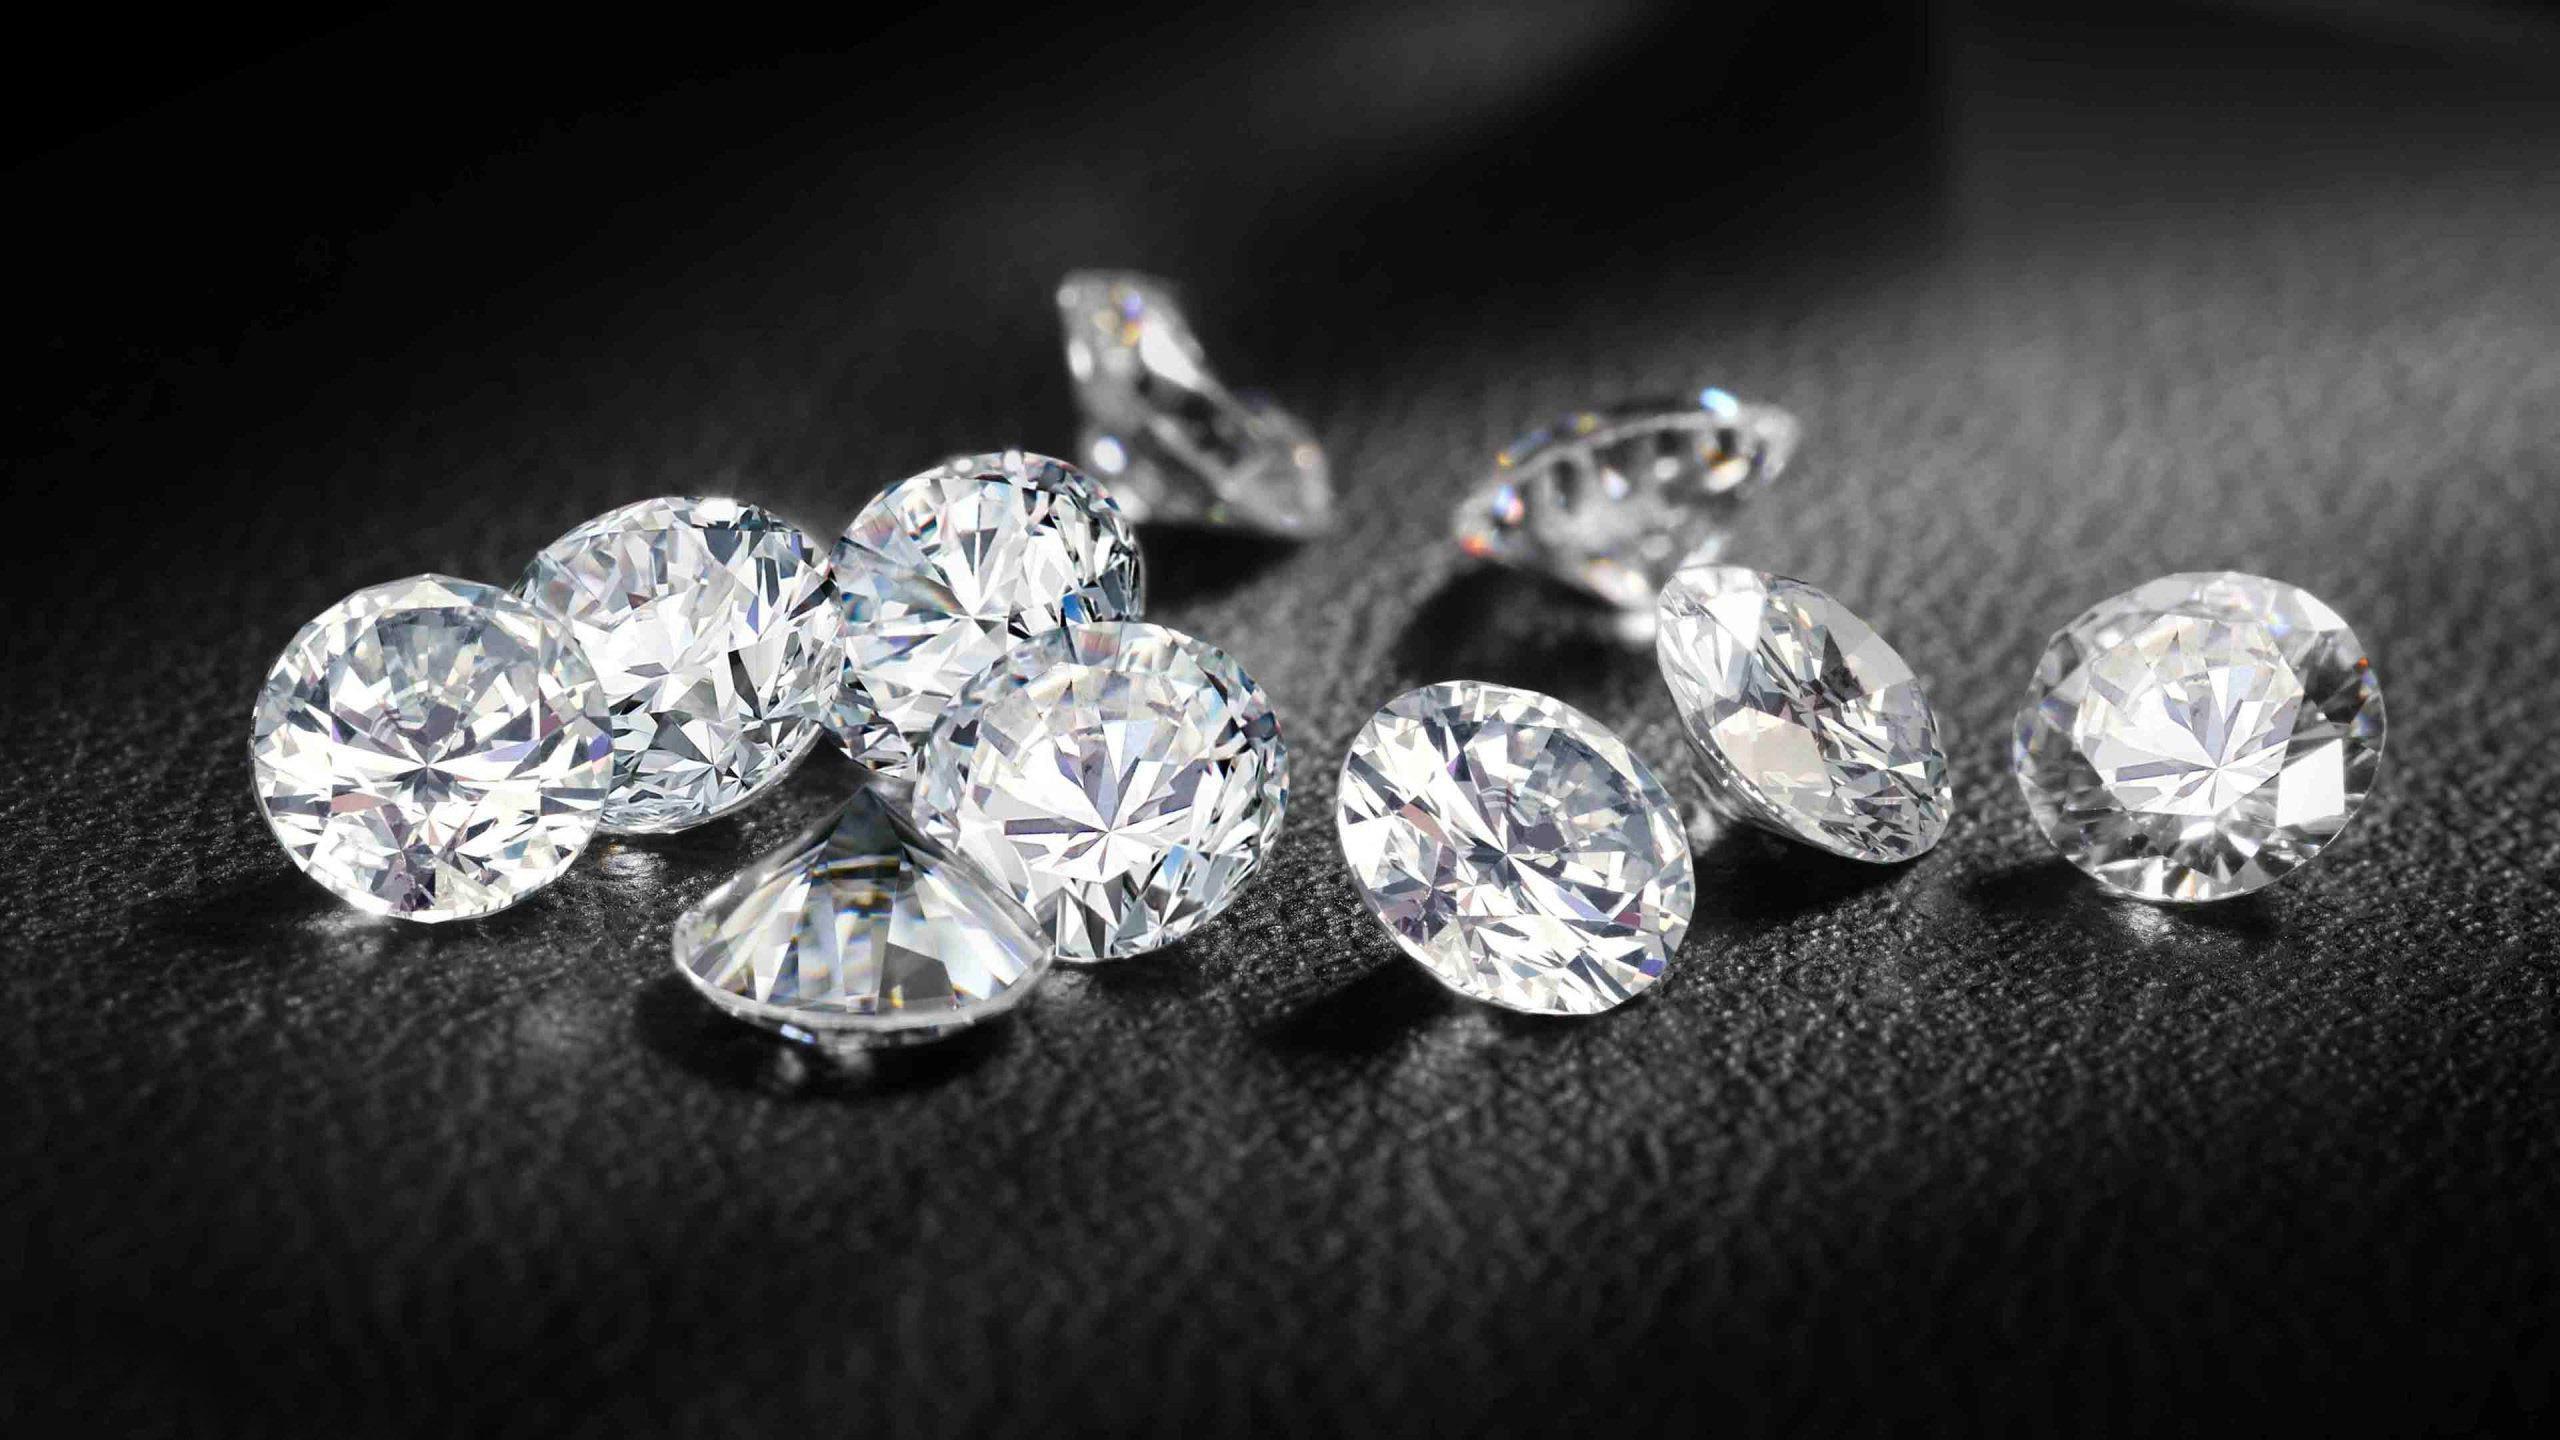 Diamonds Wallpaper 6086 2560x1440